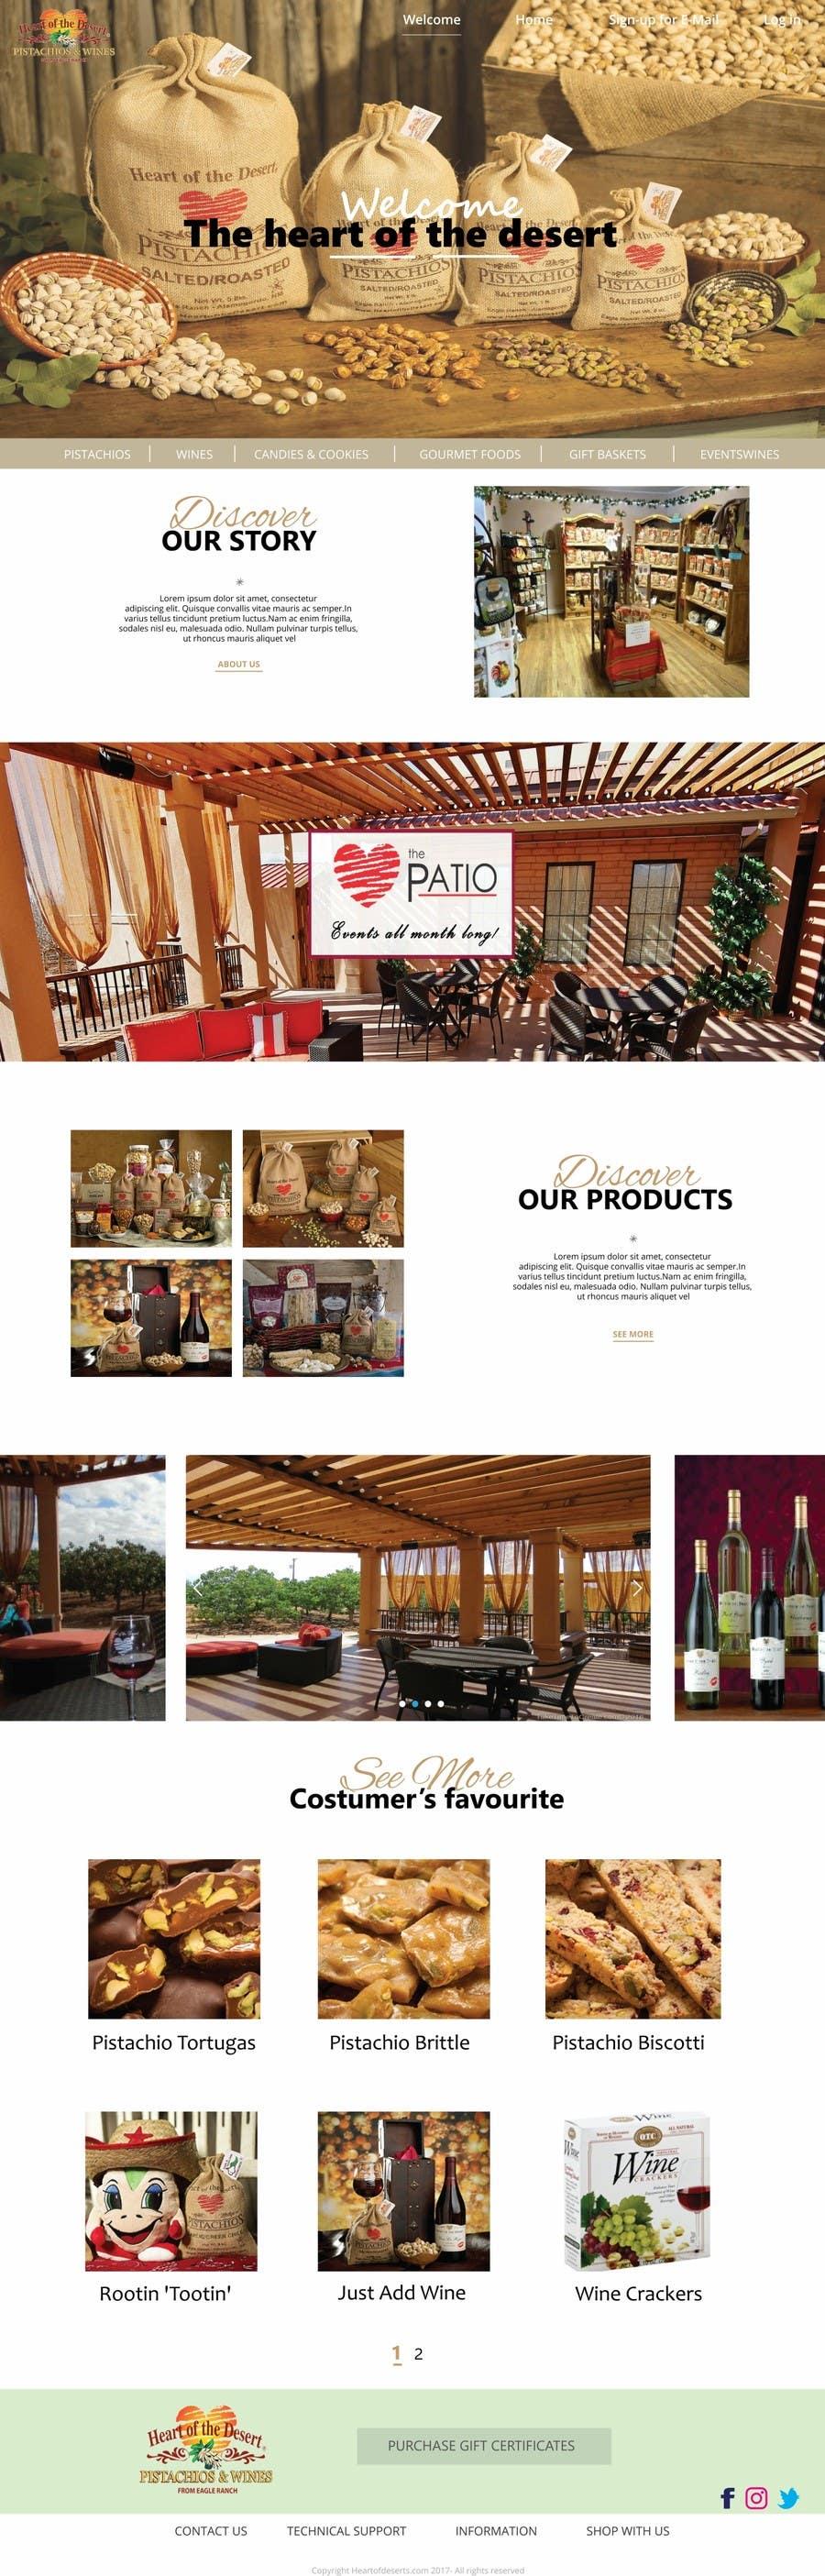 Proposition n°37 du concours Design a Website Mockup for E-commerce Site